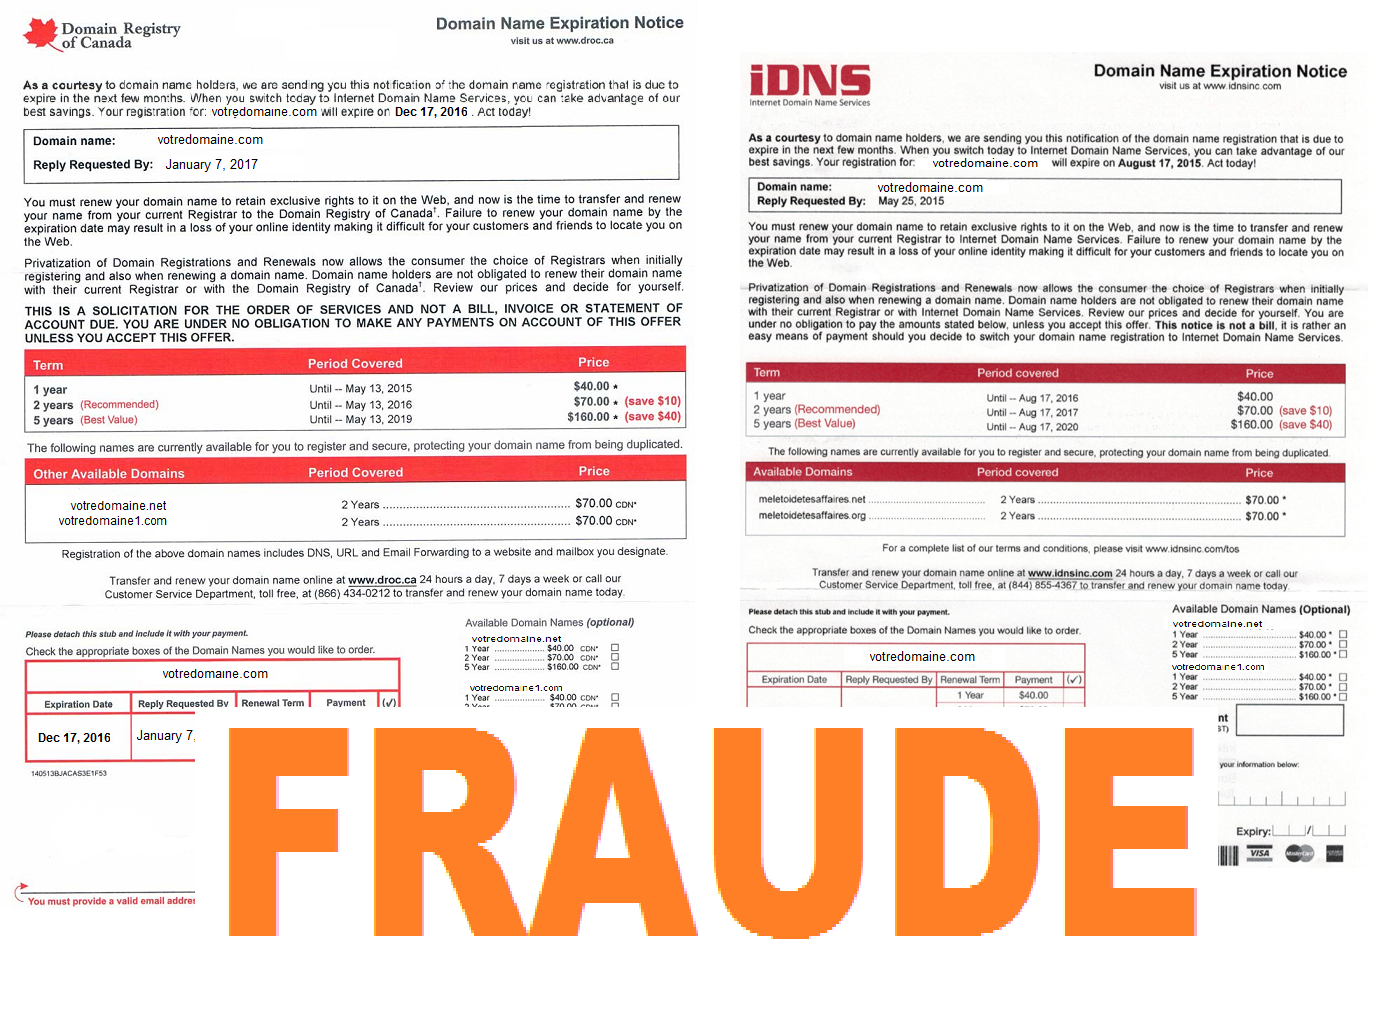 iDNS-DROC_scam-fraude